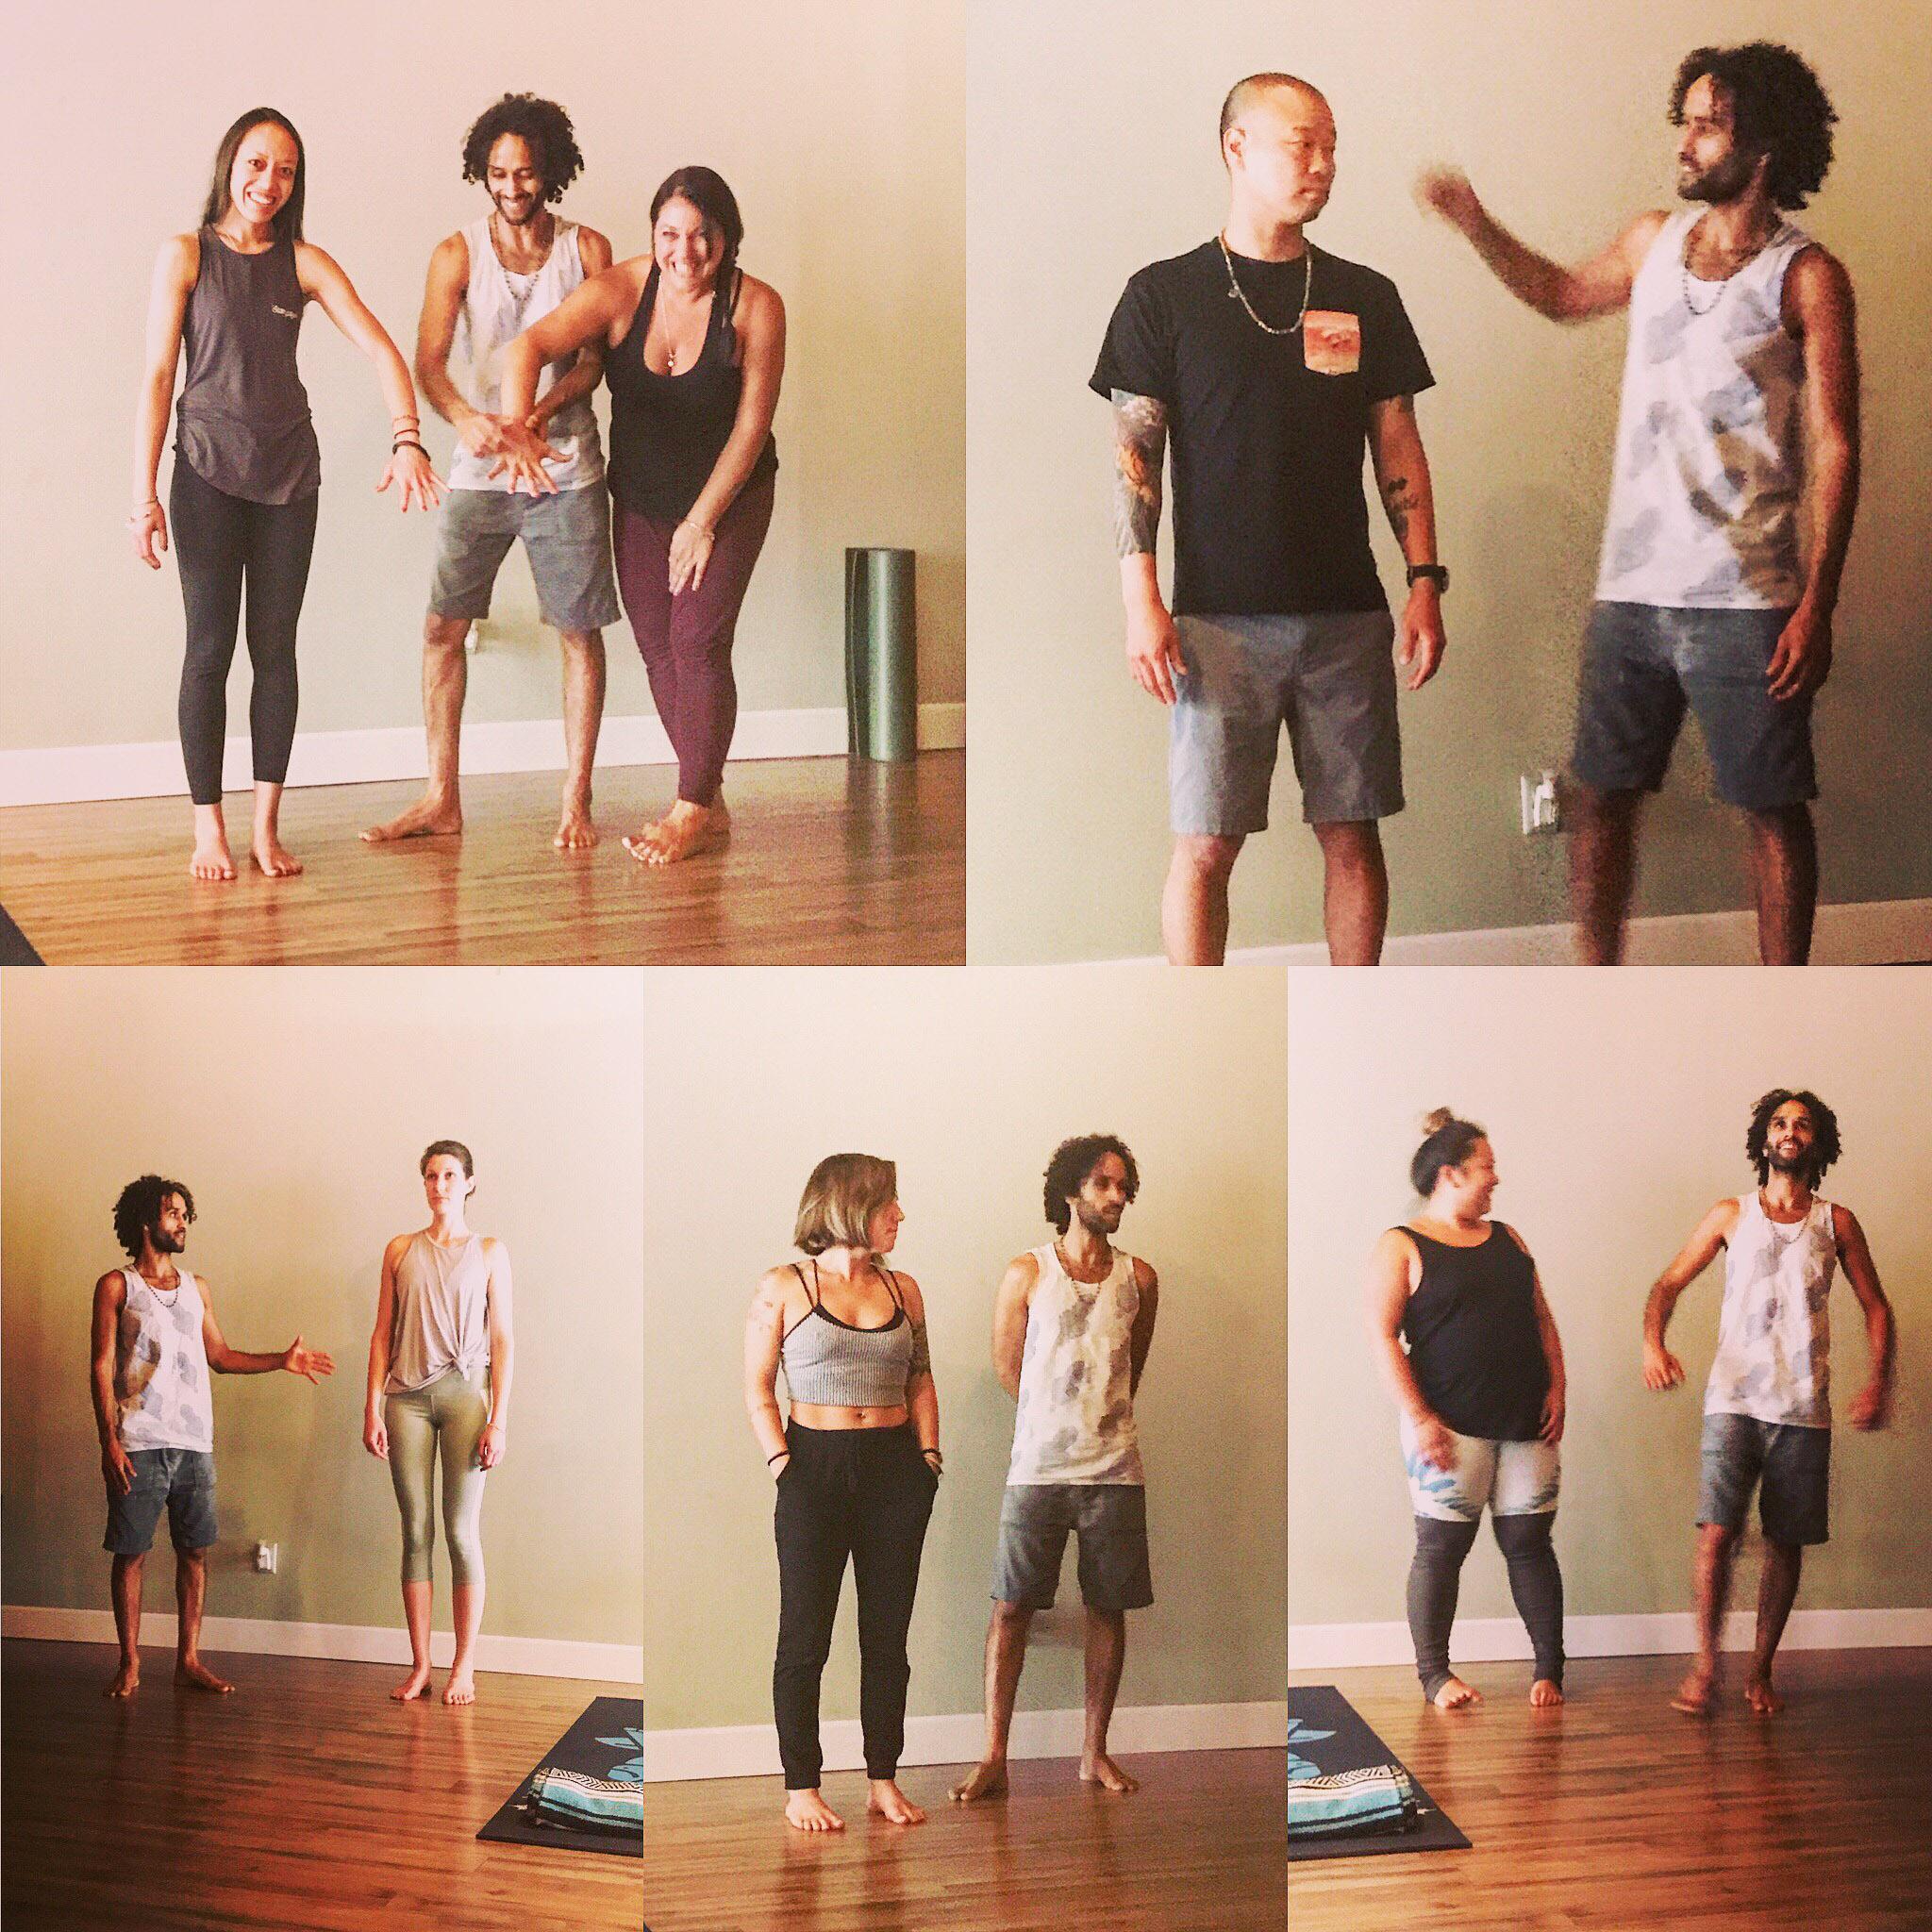 Orange County Yoga About Caffe Yoga In Tustin Ca